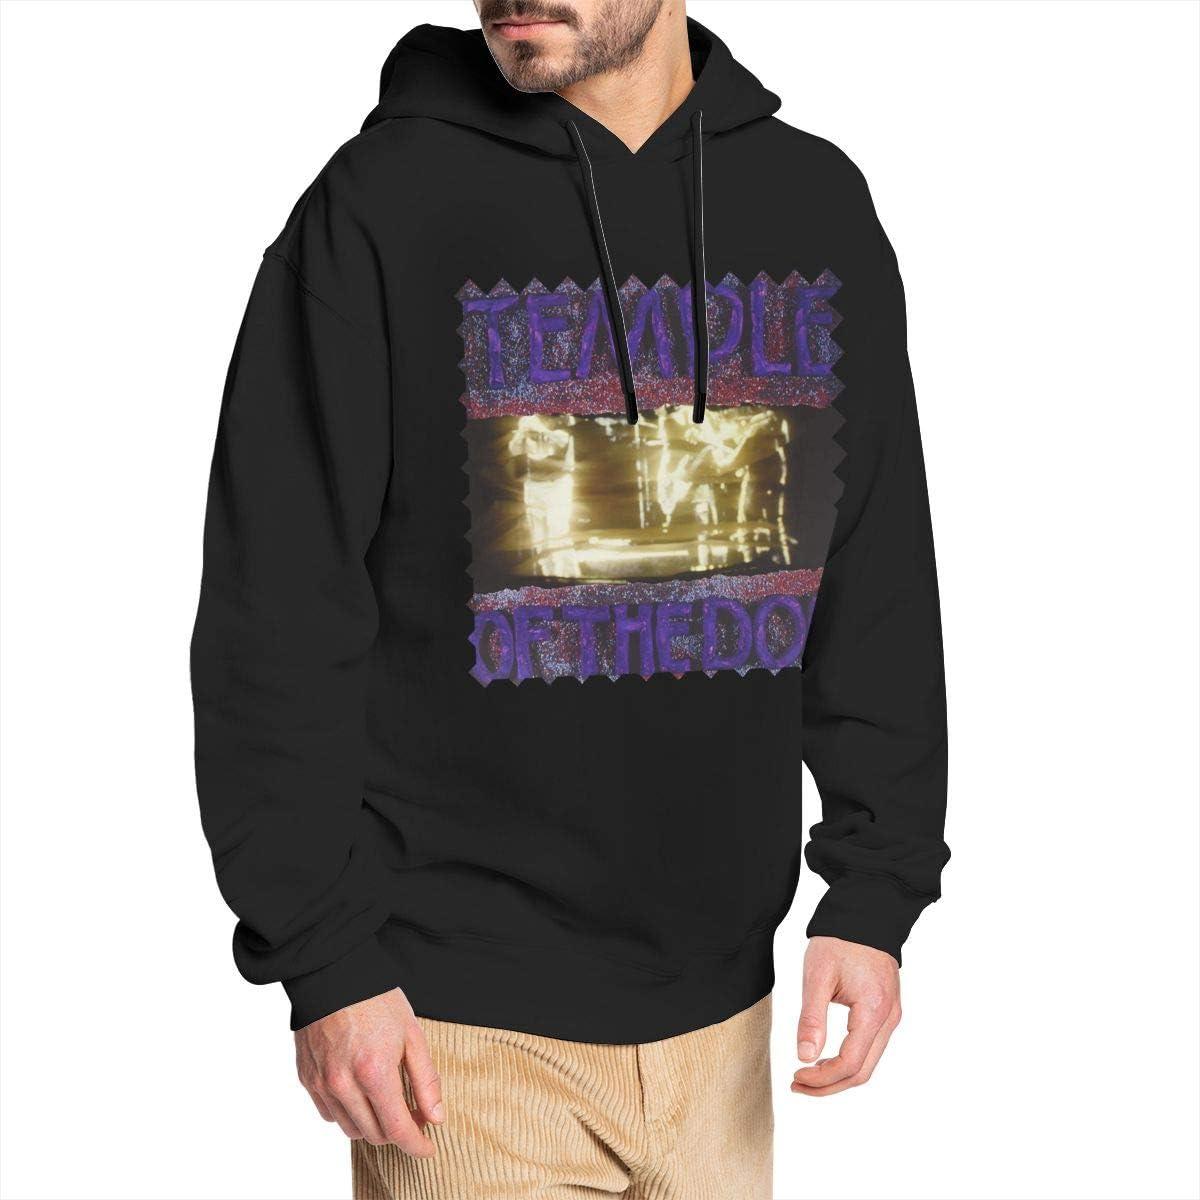 Zxcvbnm Temple-of-The-Dog Mens Hoodie Sweatshirt Black